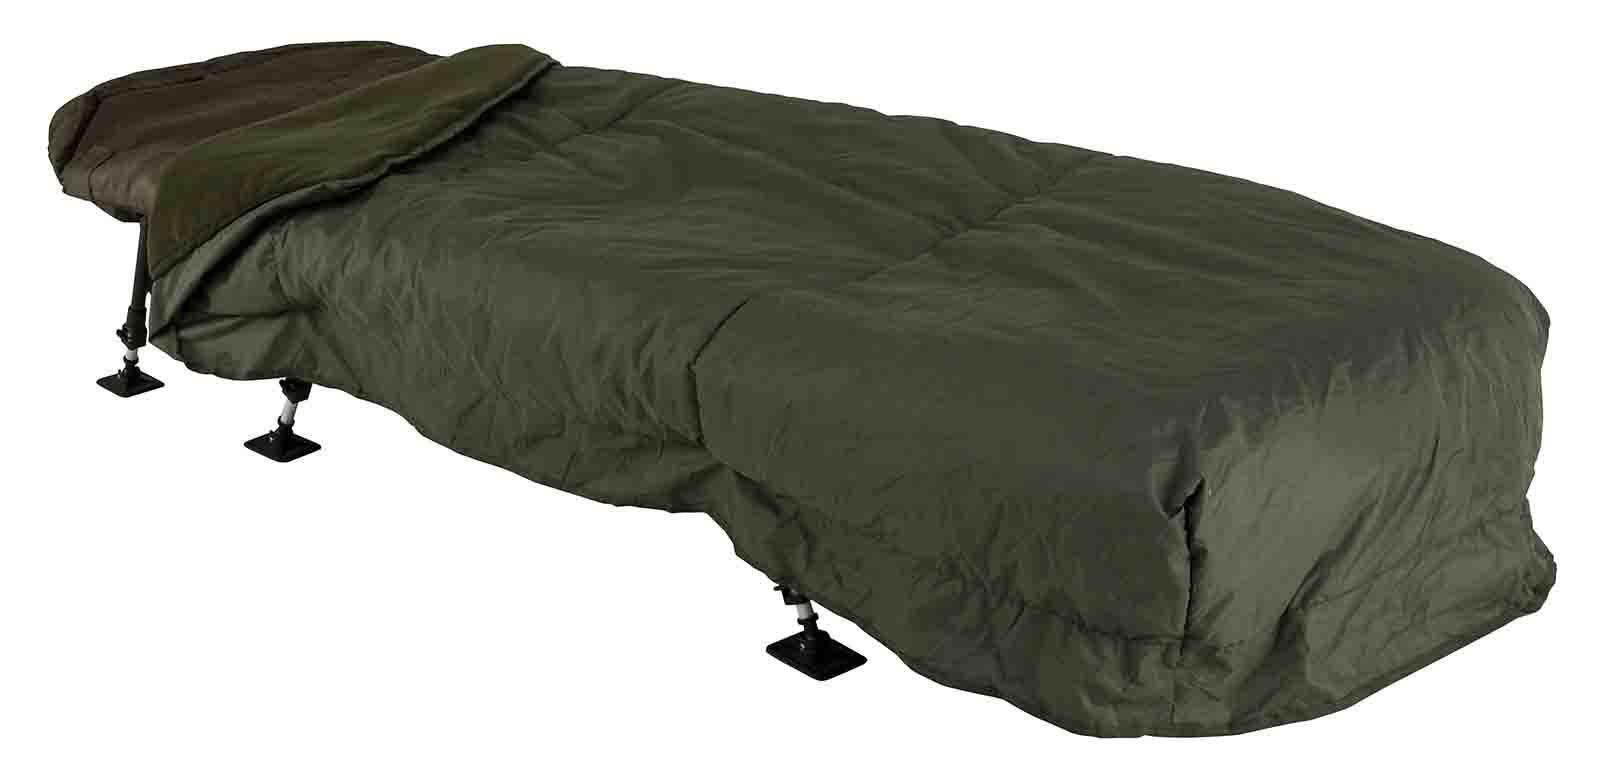 JRC New Defender Sleeping Bag & Bed Water Resistant Cover Combo Carp Fishing